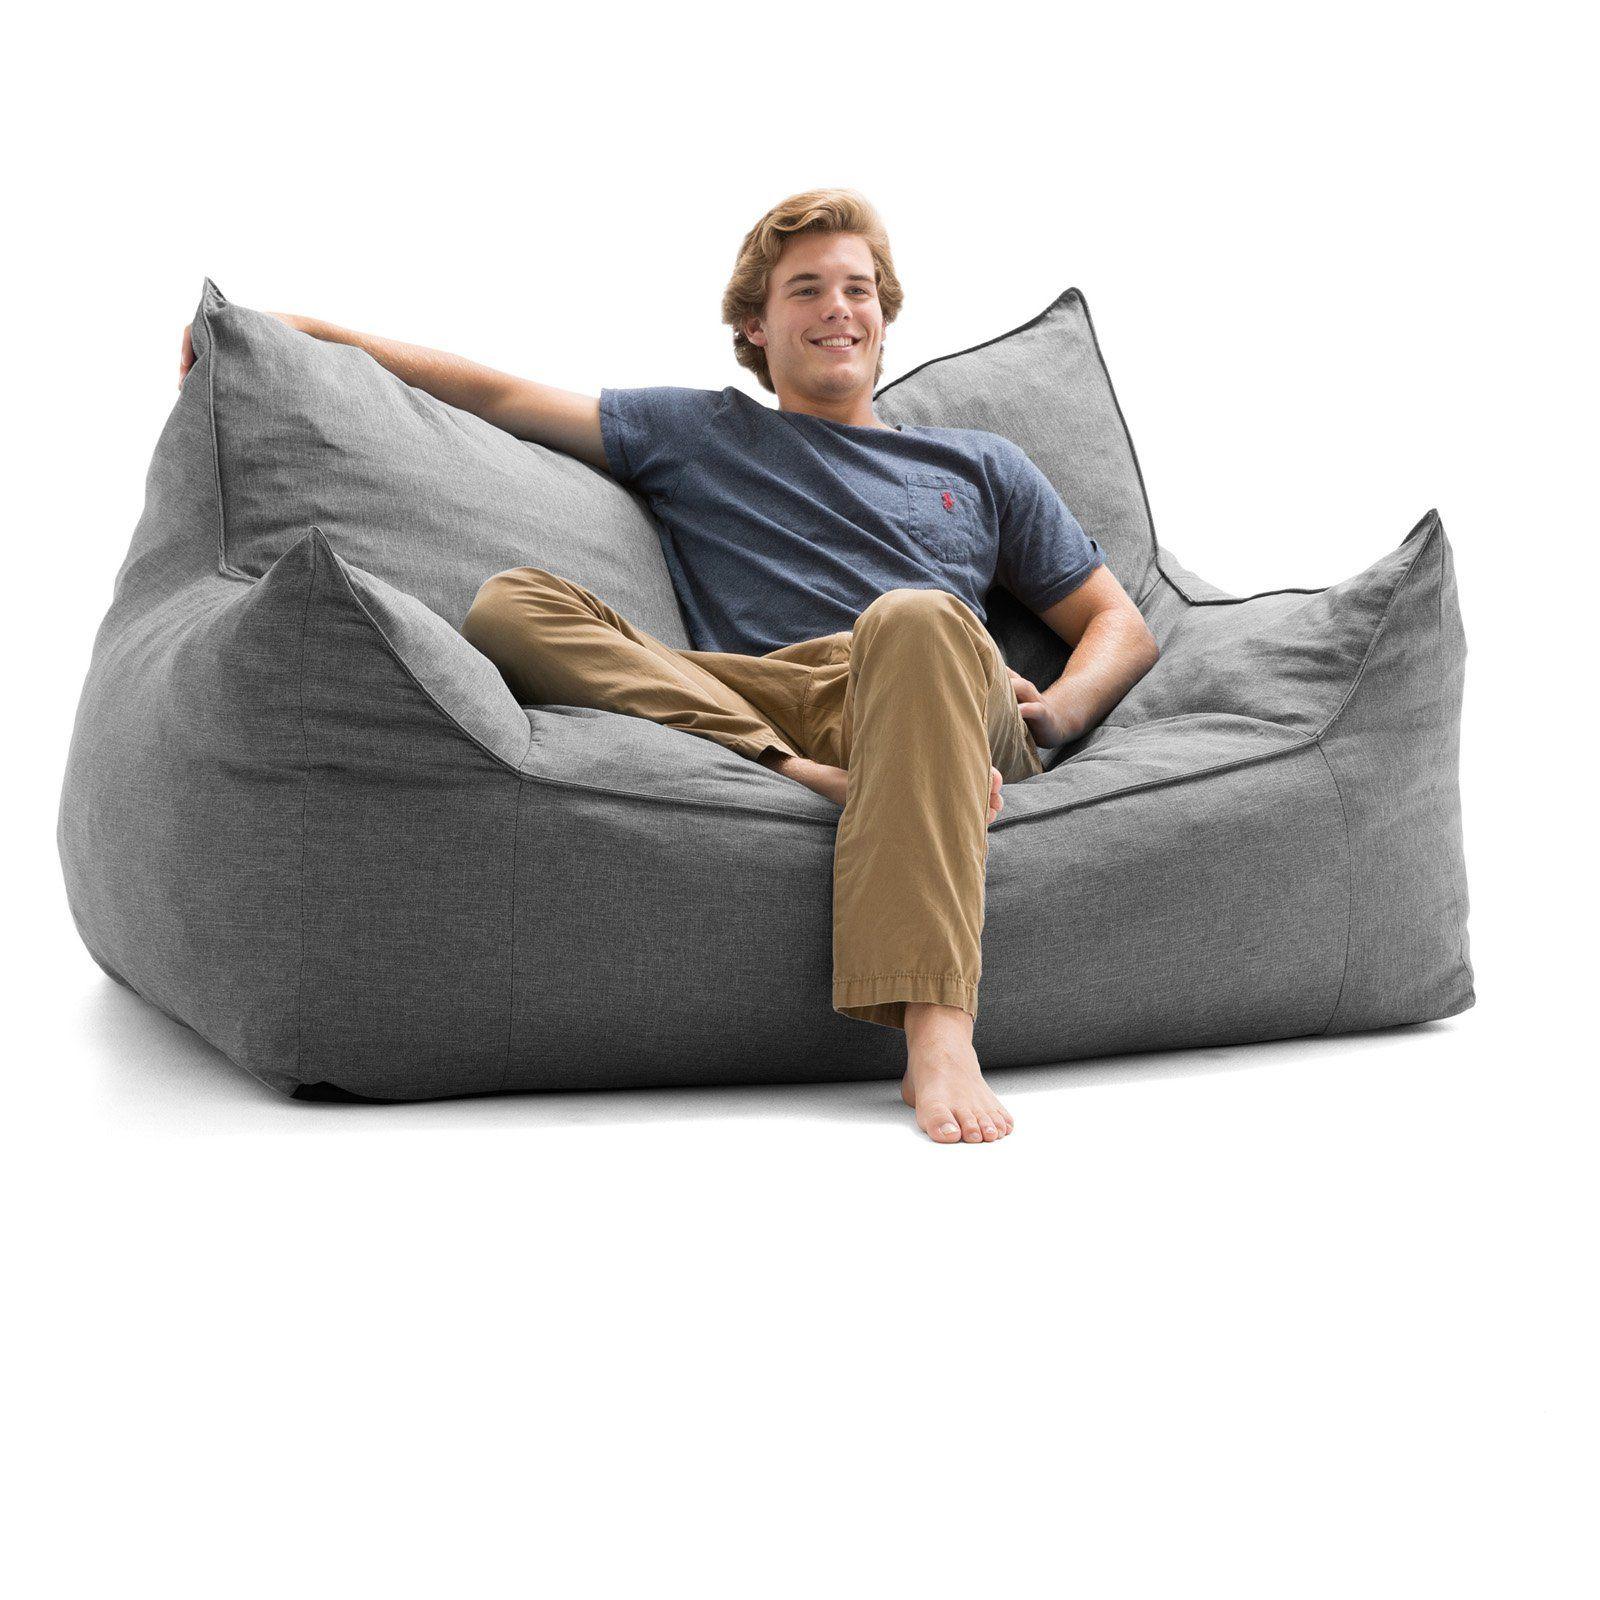 Union Grey Union Comfort Research Big Joe Hug Bean Bag Chair